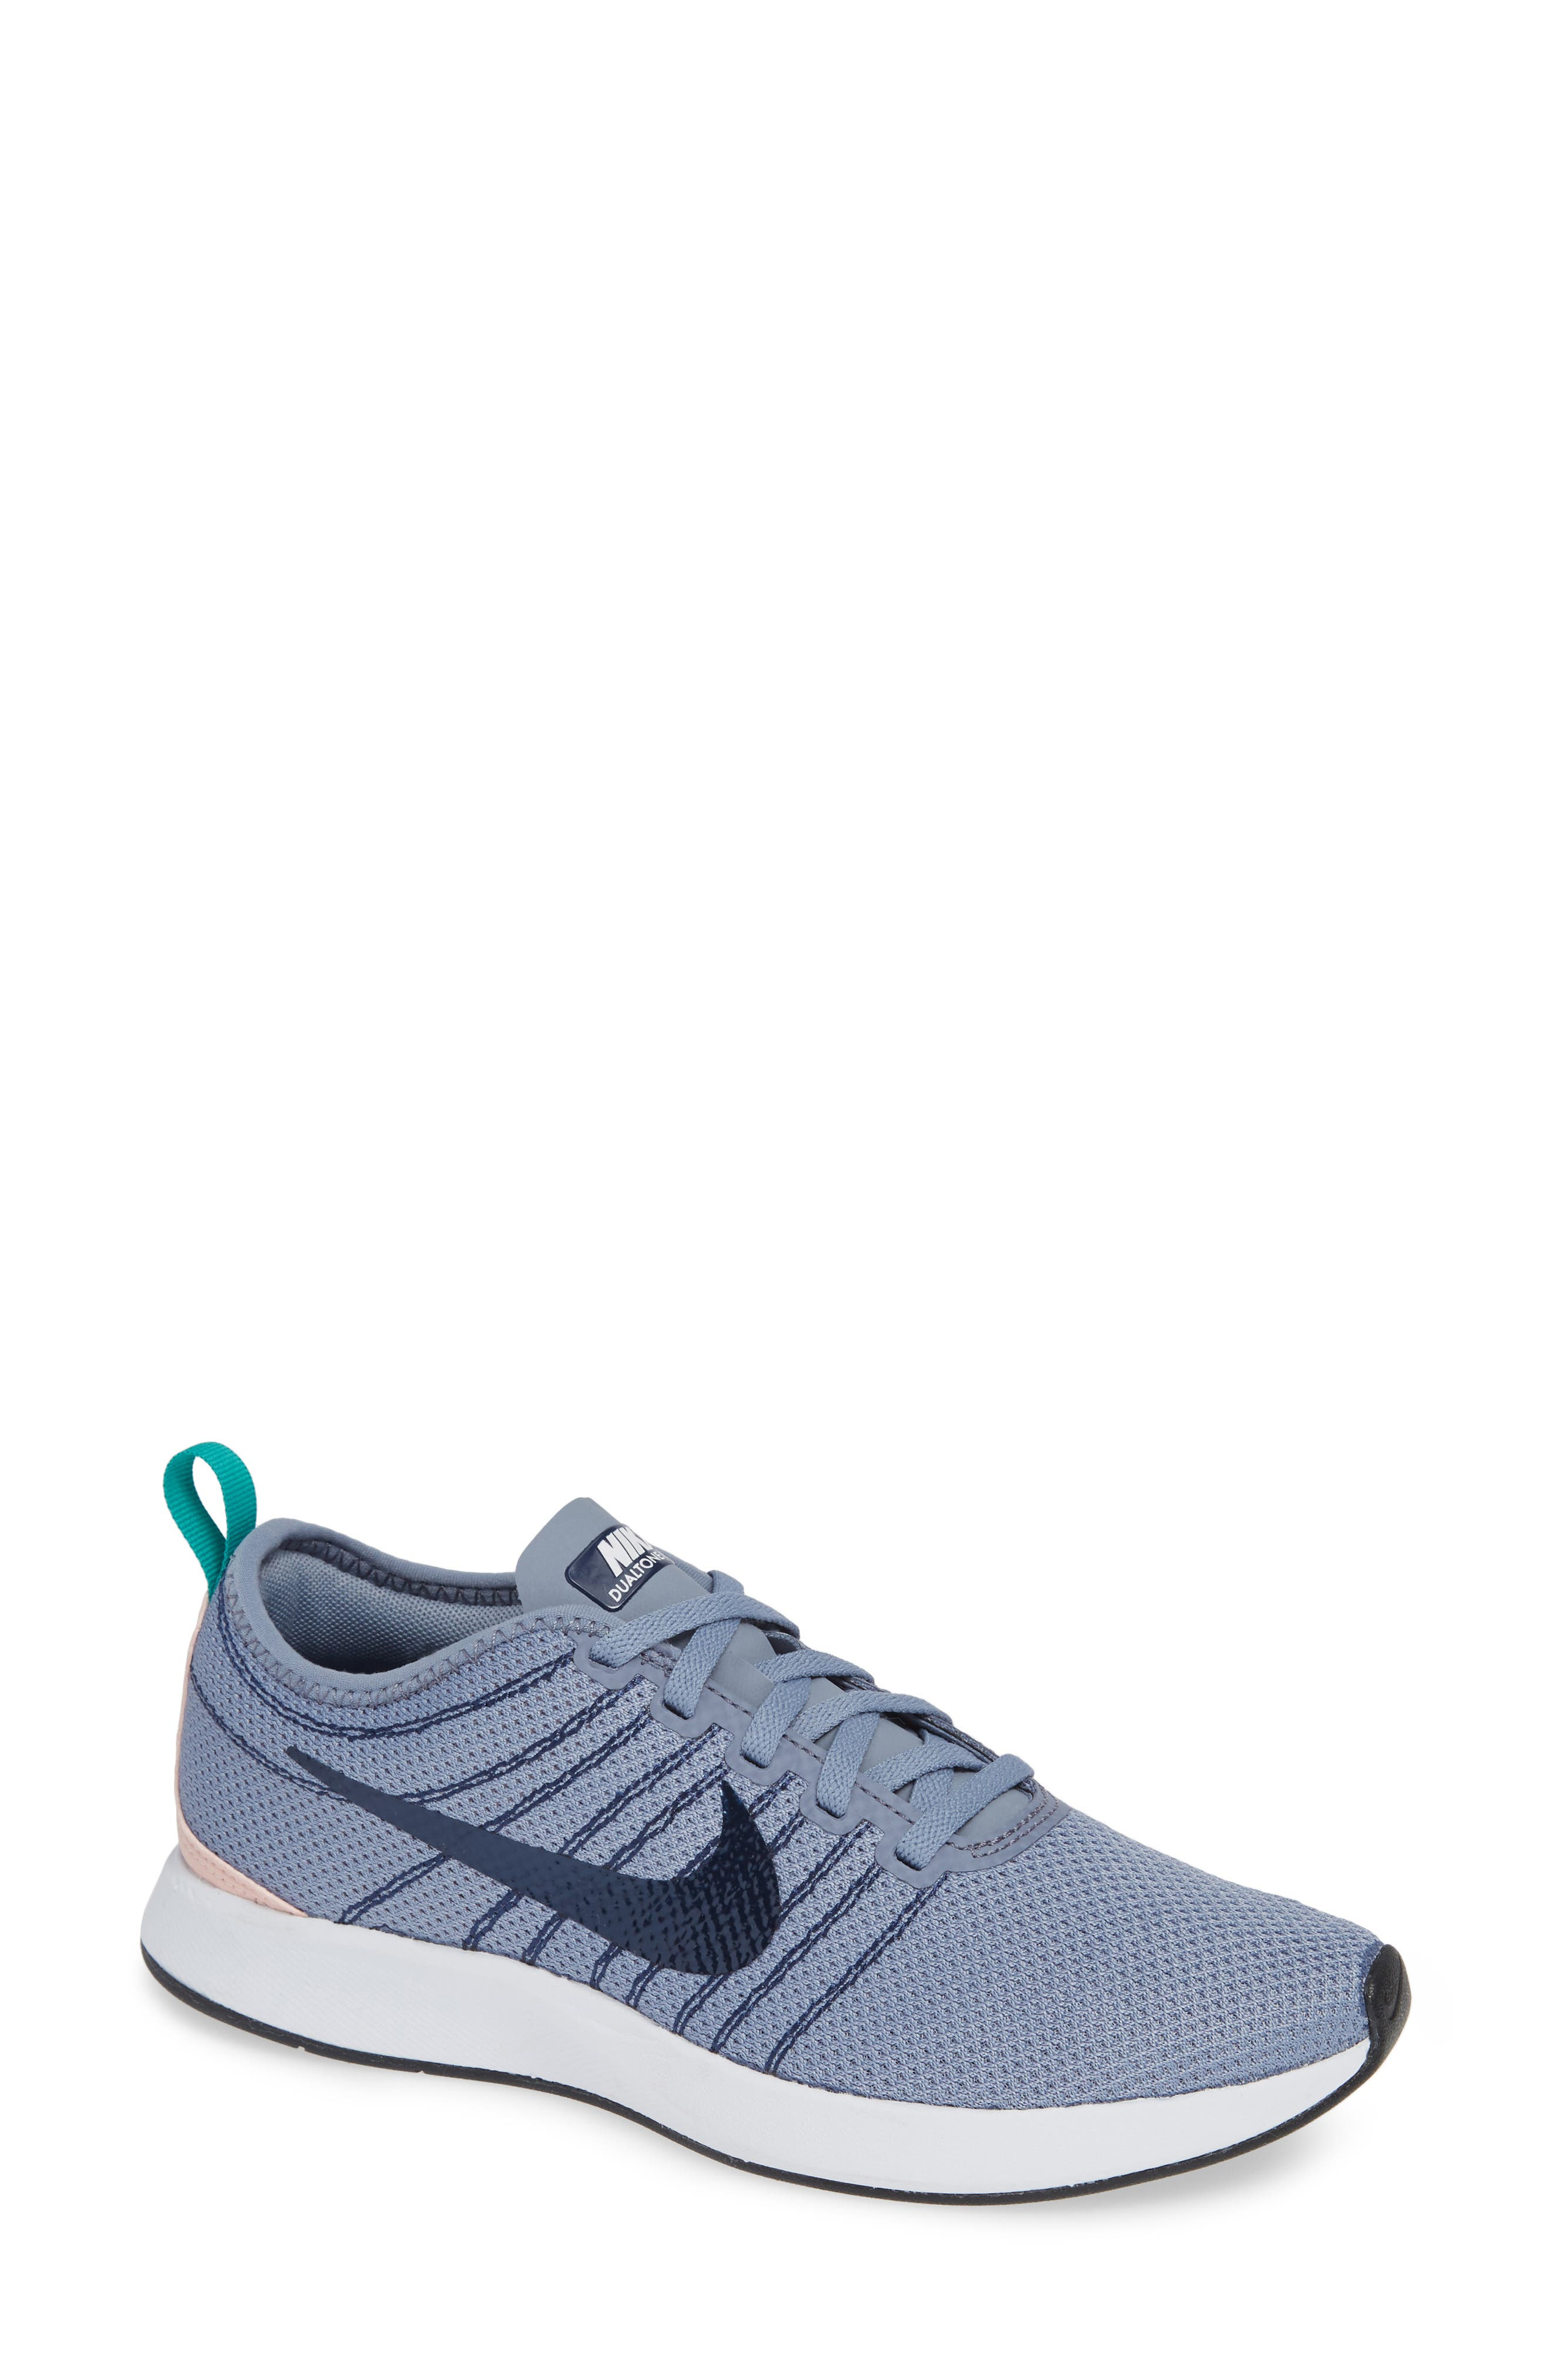 Dualtone Racer Running Shoe,                         Main,                         color, ASHEN SLATE/ NAVY/ STORM PINK